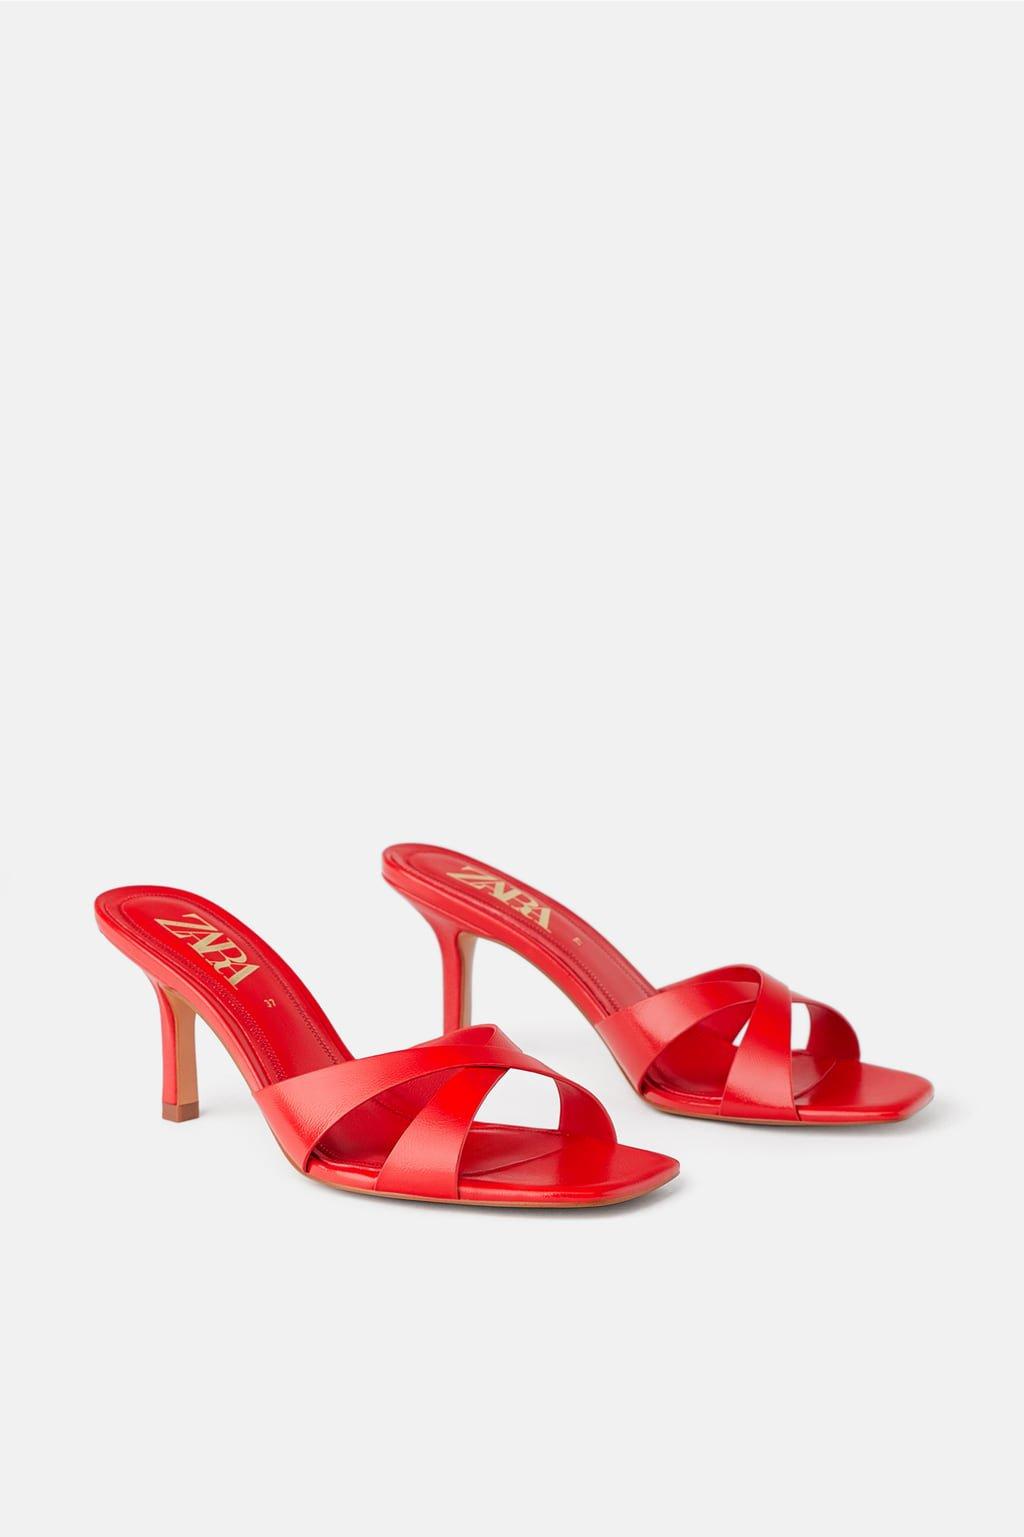 Zara Tacón Cruzadas Mujer Mule Sandalias Zapatos Tiras xdCoerB